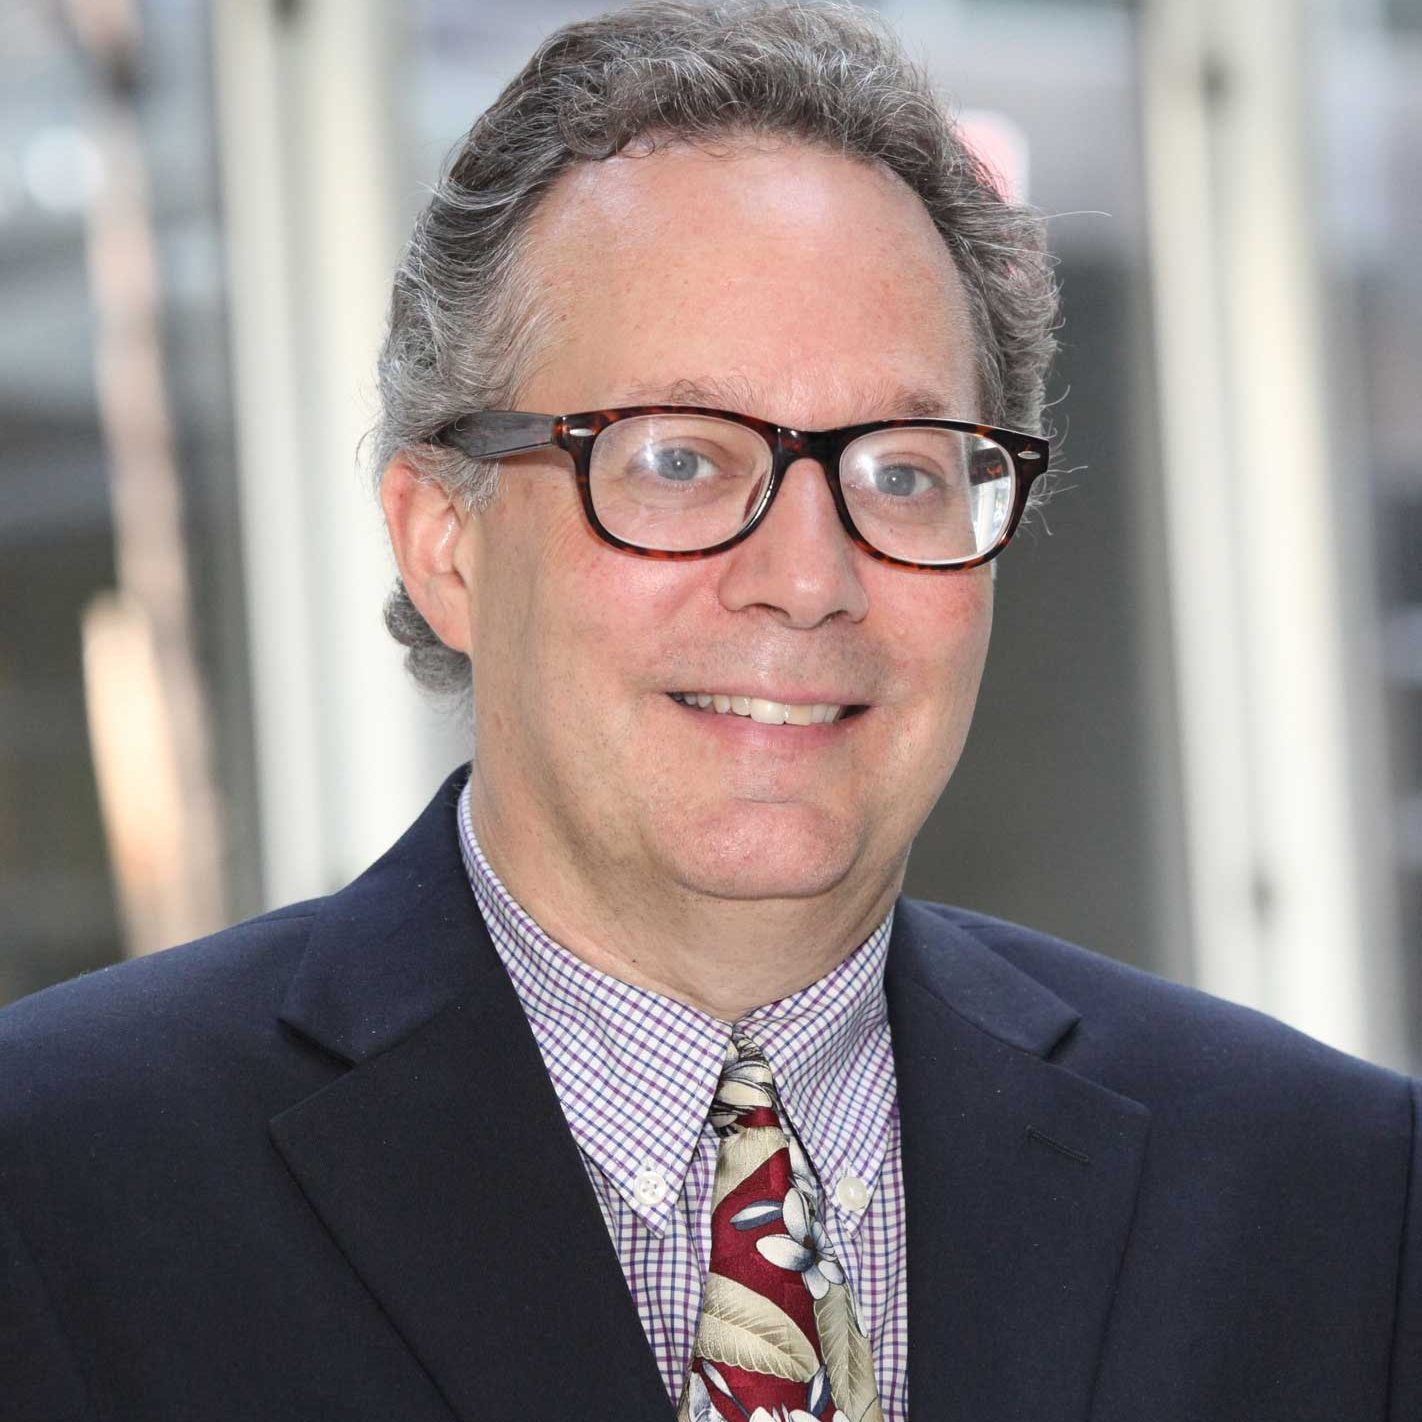 Rob Rinderman, Former Managing Director of ScreenTrade Media